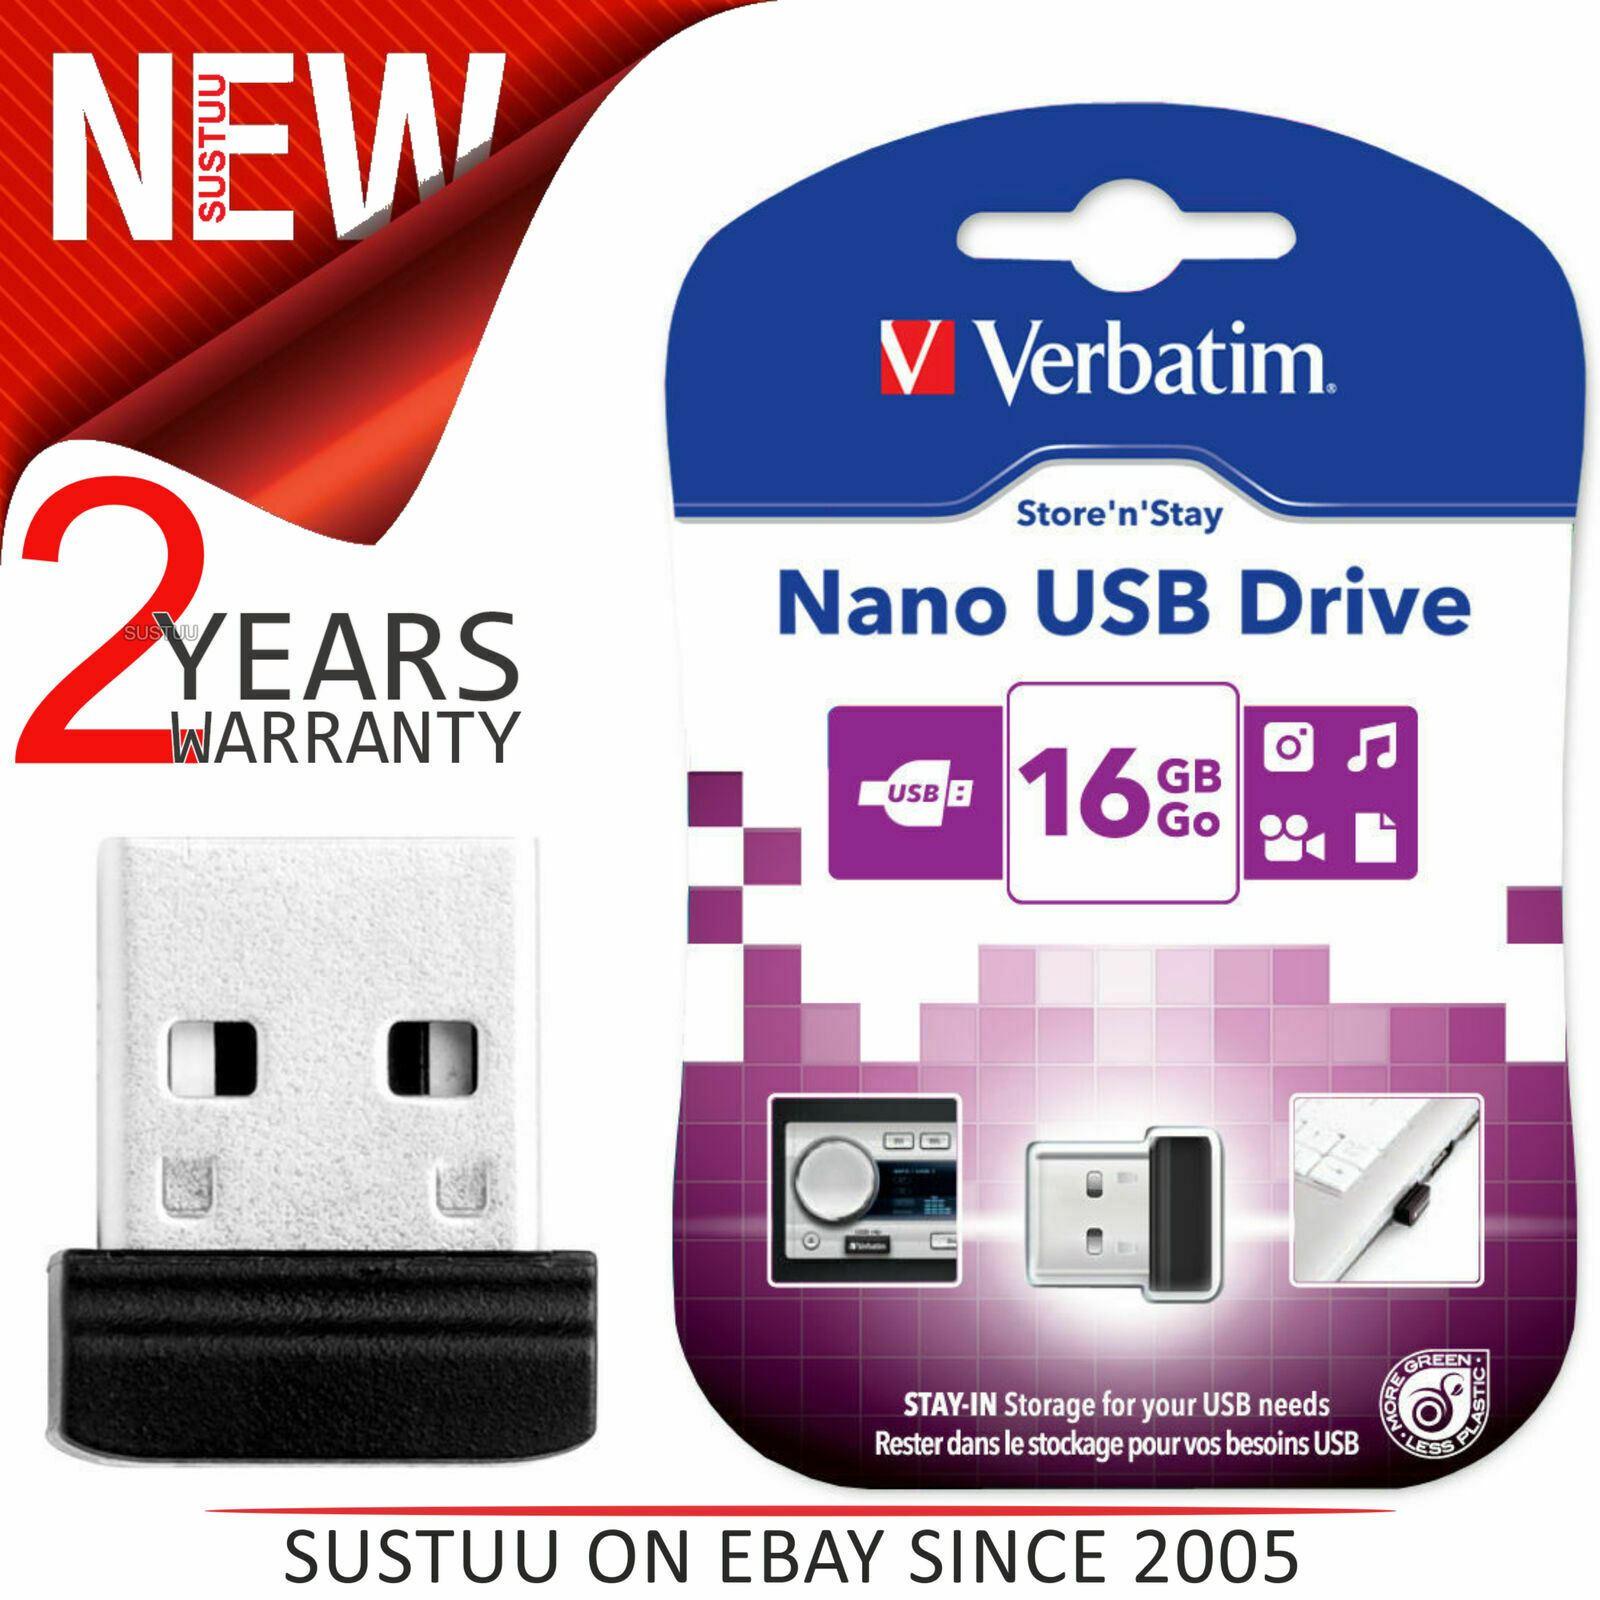 Clef usb 16go Verbatim cle usb 16 go Store N/'Stay Nano slim mini USB 2.0